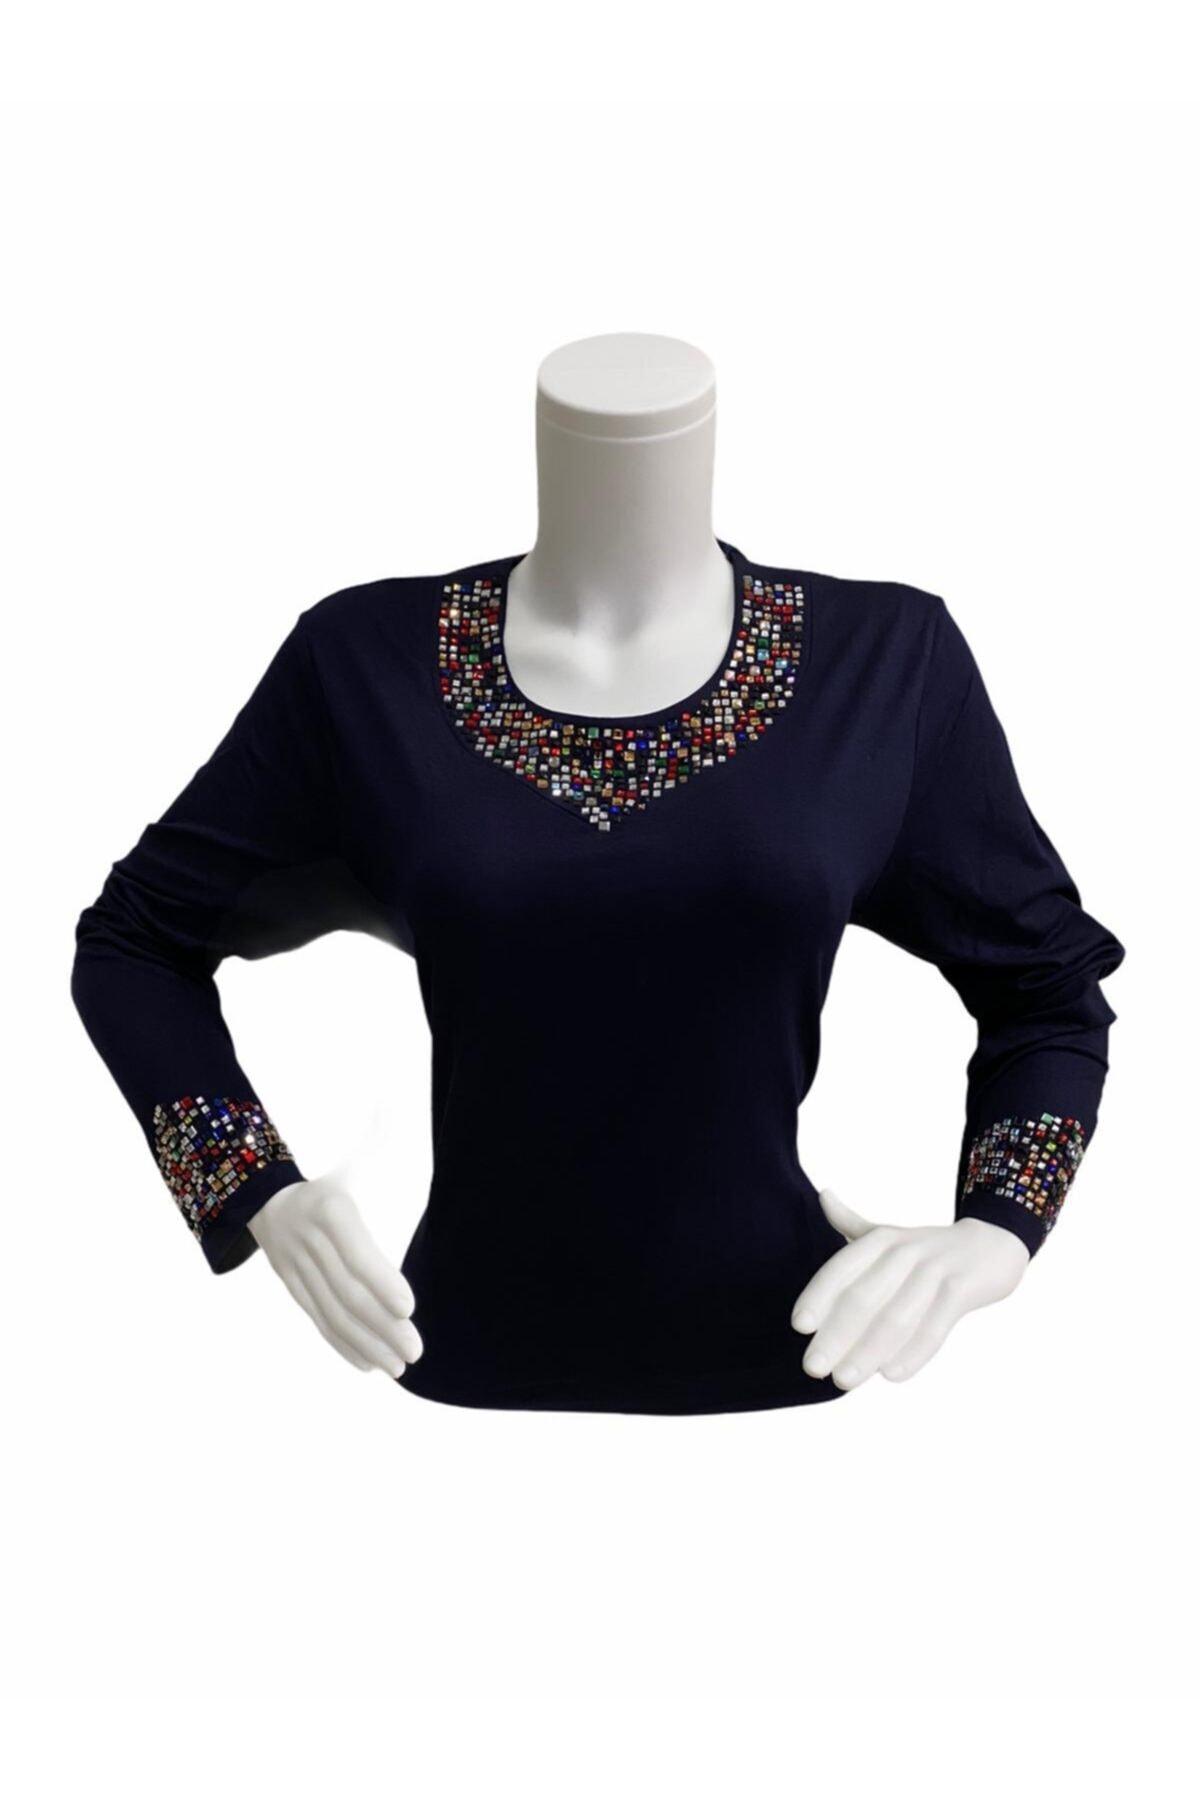 Elele Lacivert Renkli Taş Baskı 0 Yaka Anne Penye Bluz 2